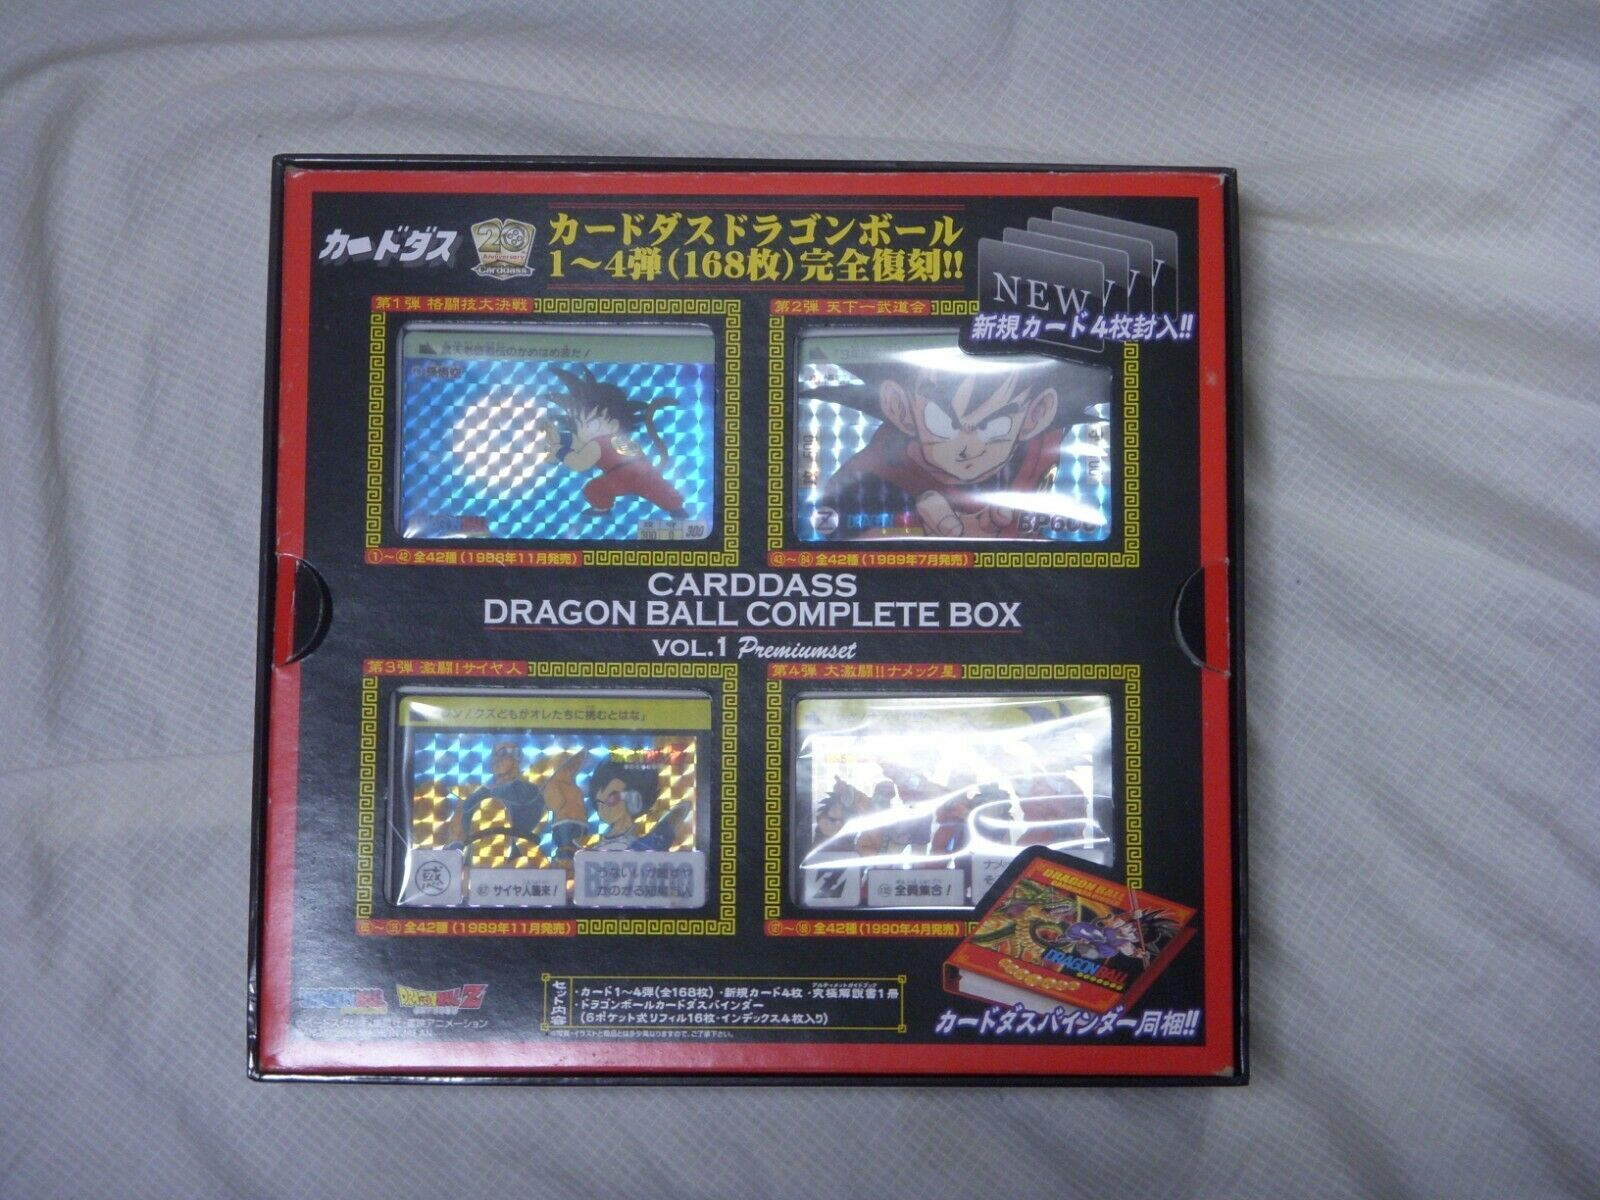 SALE BANDAI Carddass DRAGONBALL Z Complete Box Vol.1